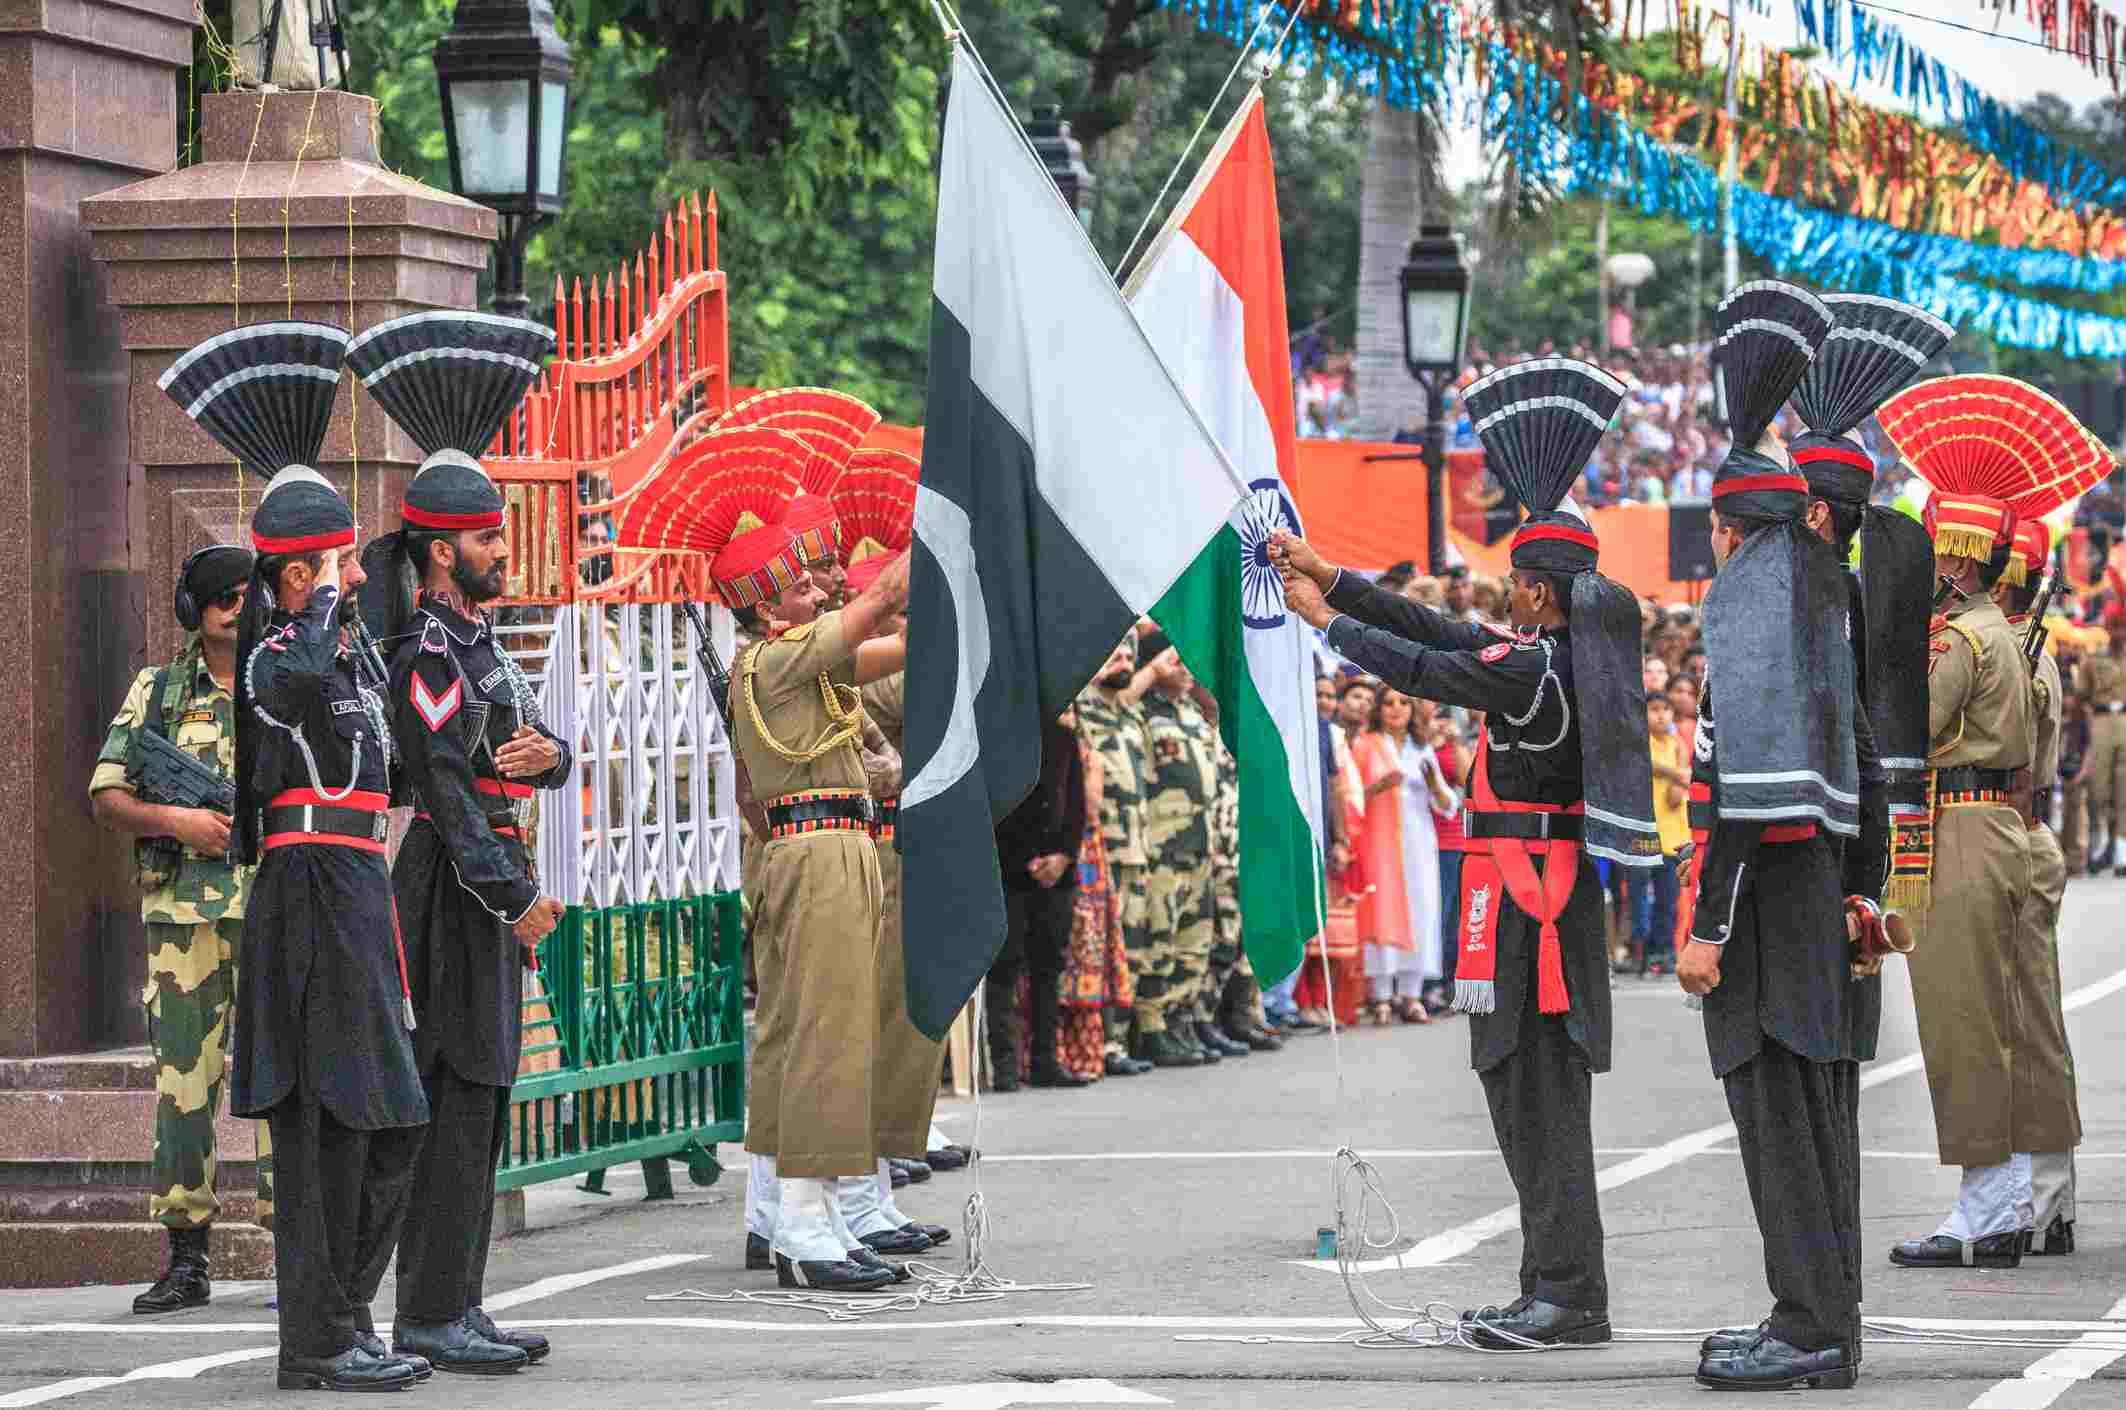 13 Photos of the Dramatic Wagah Border Flag Ceremony